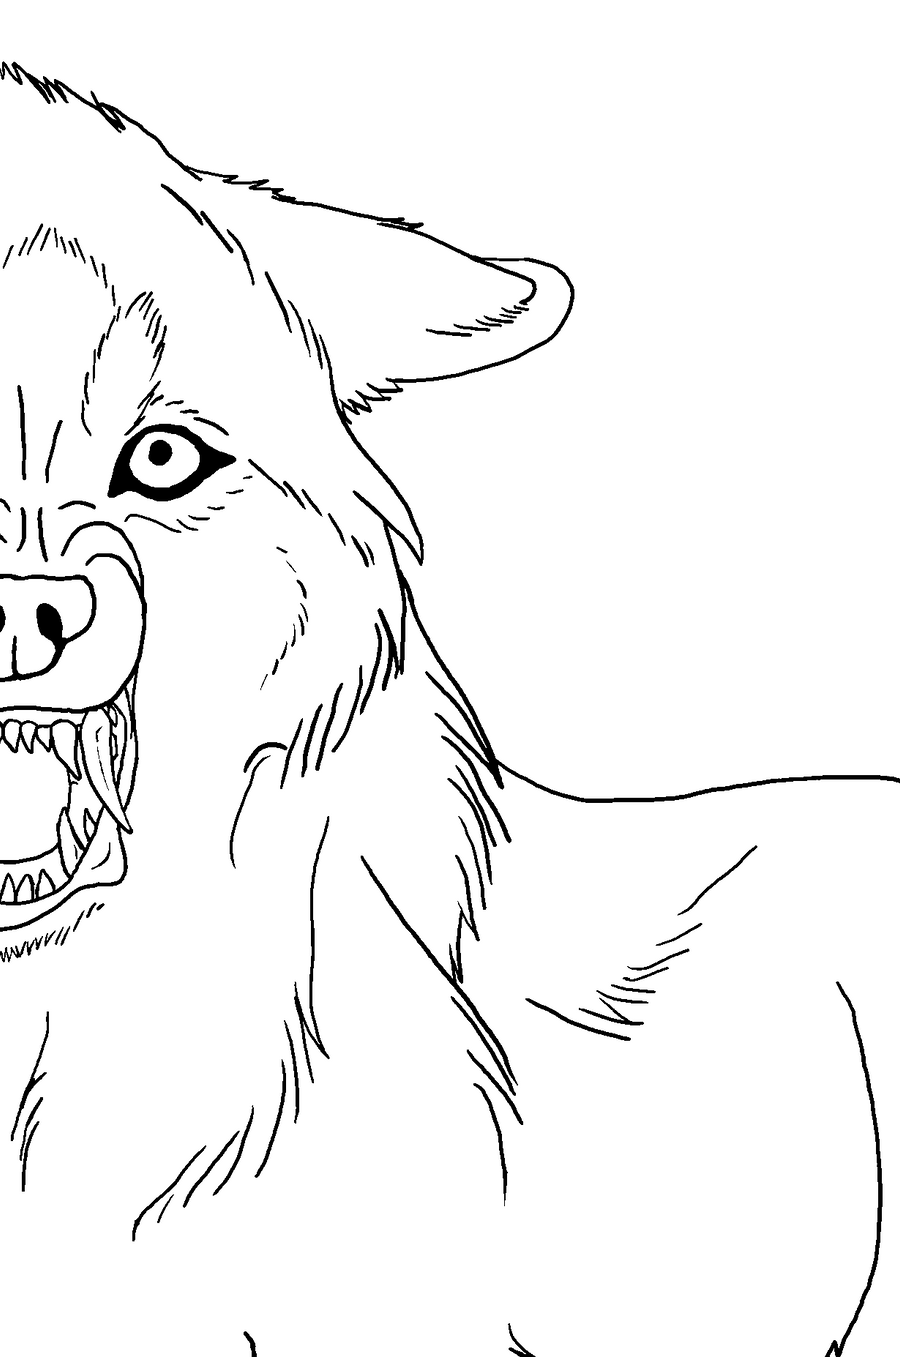 Howling Wolf Line Drawing_pdf  Docscrewbanks